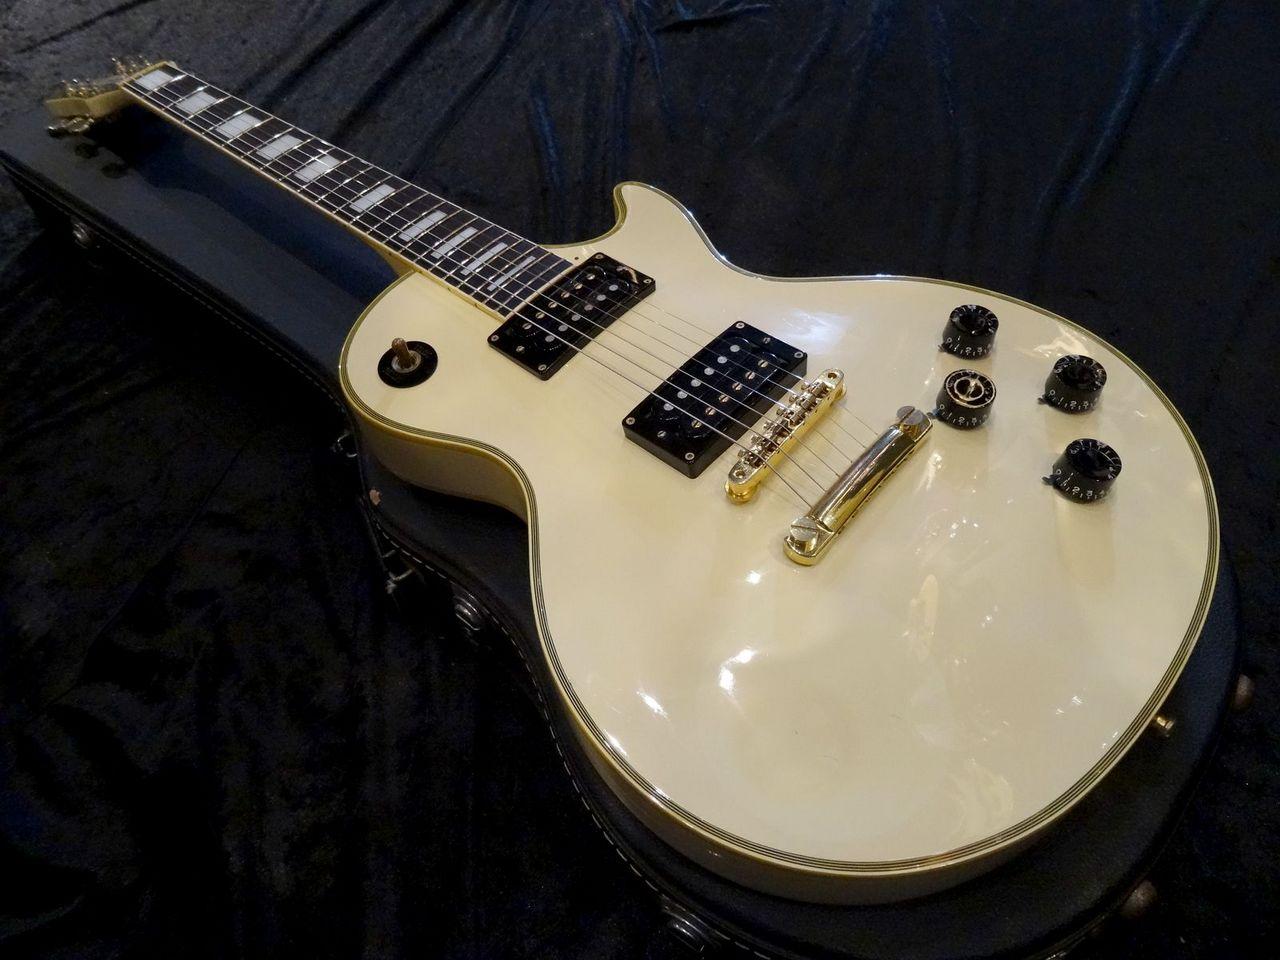 burny rlc 60 super grade model 中古 楽器検索デジマート